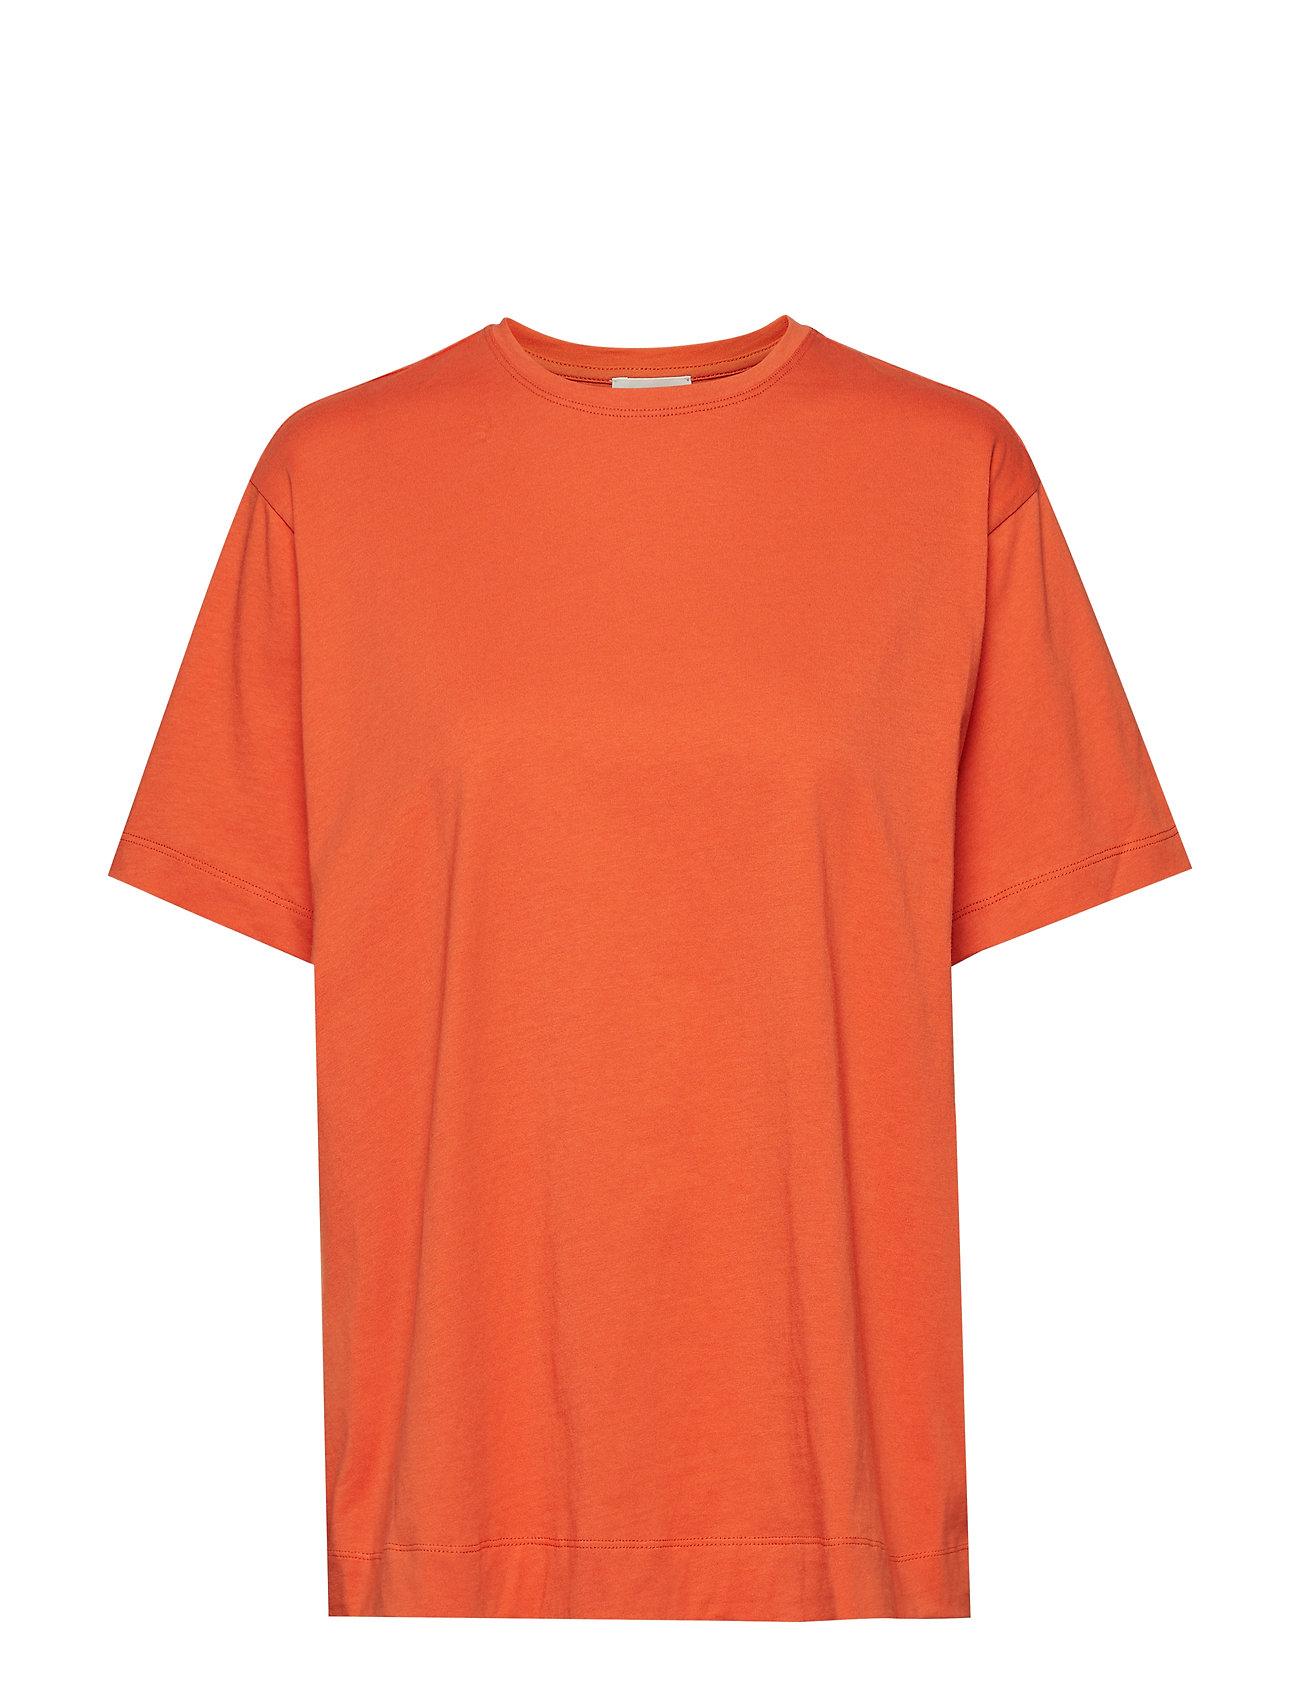 Image of Tsh5009s91 T-shirt Top Orange By Malene Birger (3346155363)